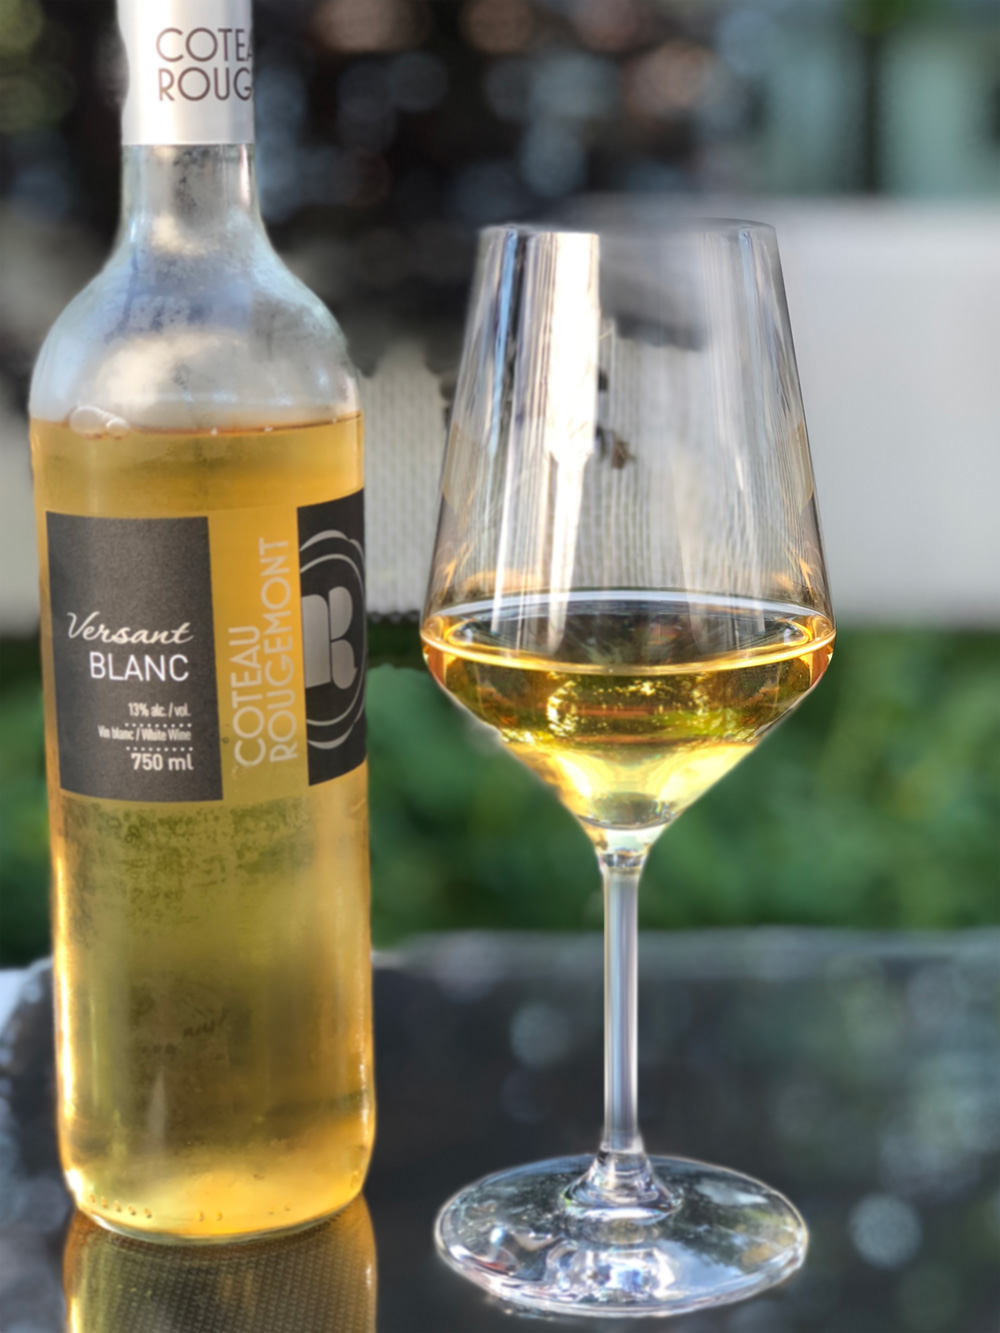 vin Dorothee epicurienne blanc